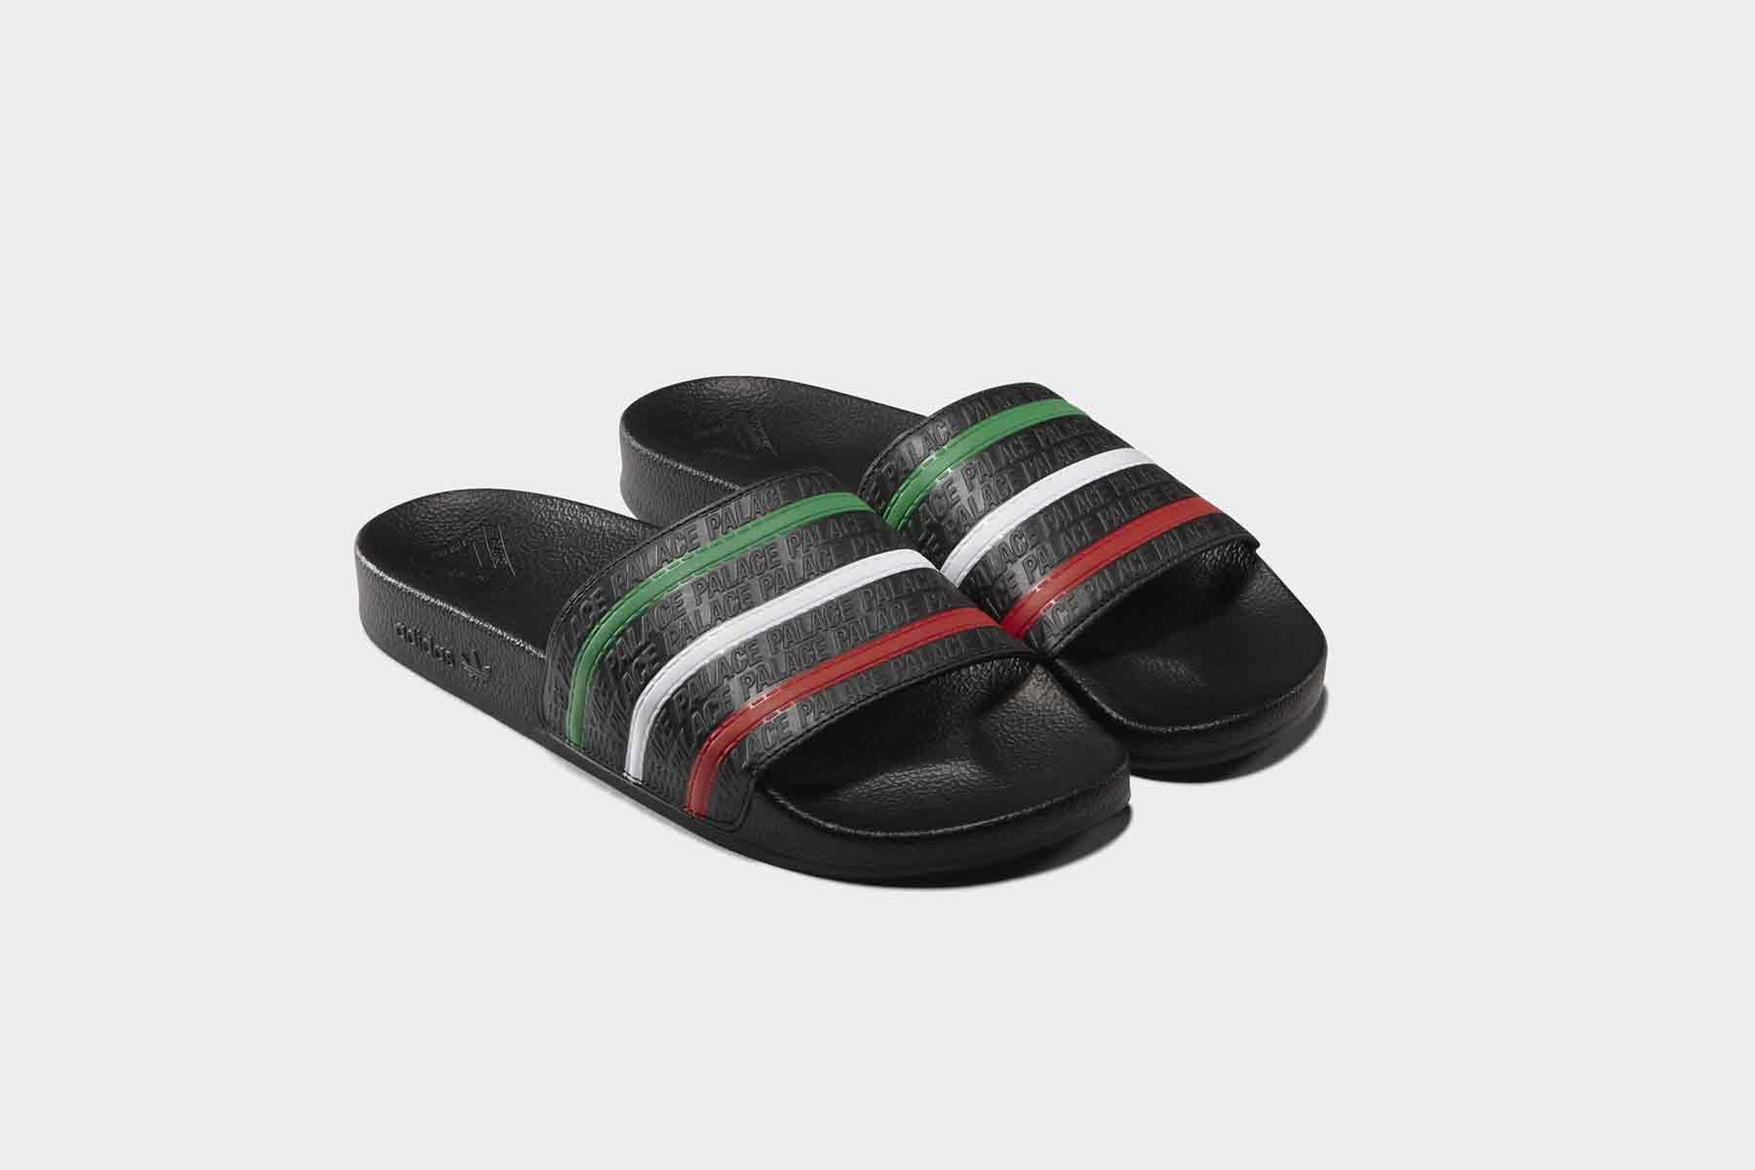 palace-adidas-originals-summer-2018-collection-8.jpg